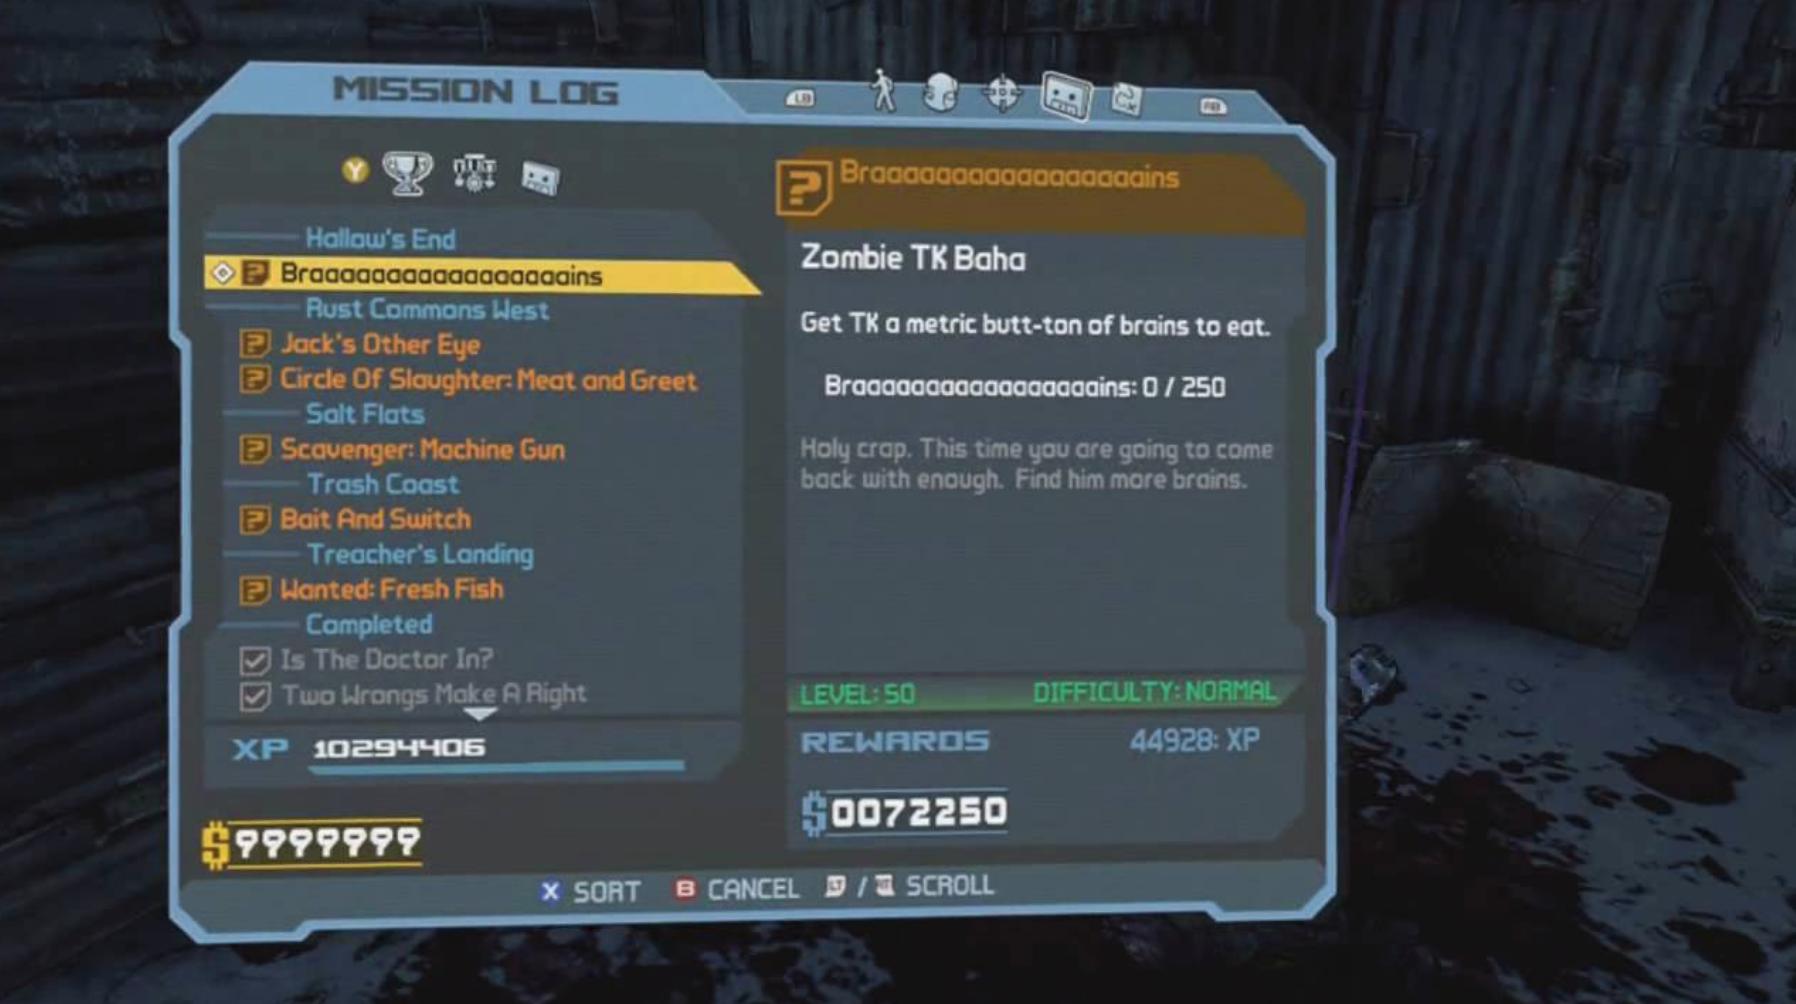 Ha… mission said Butt